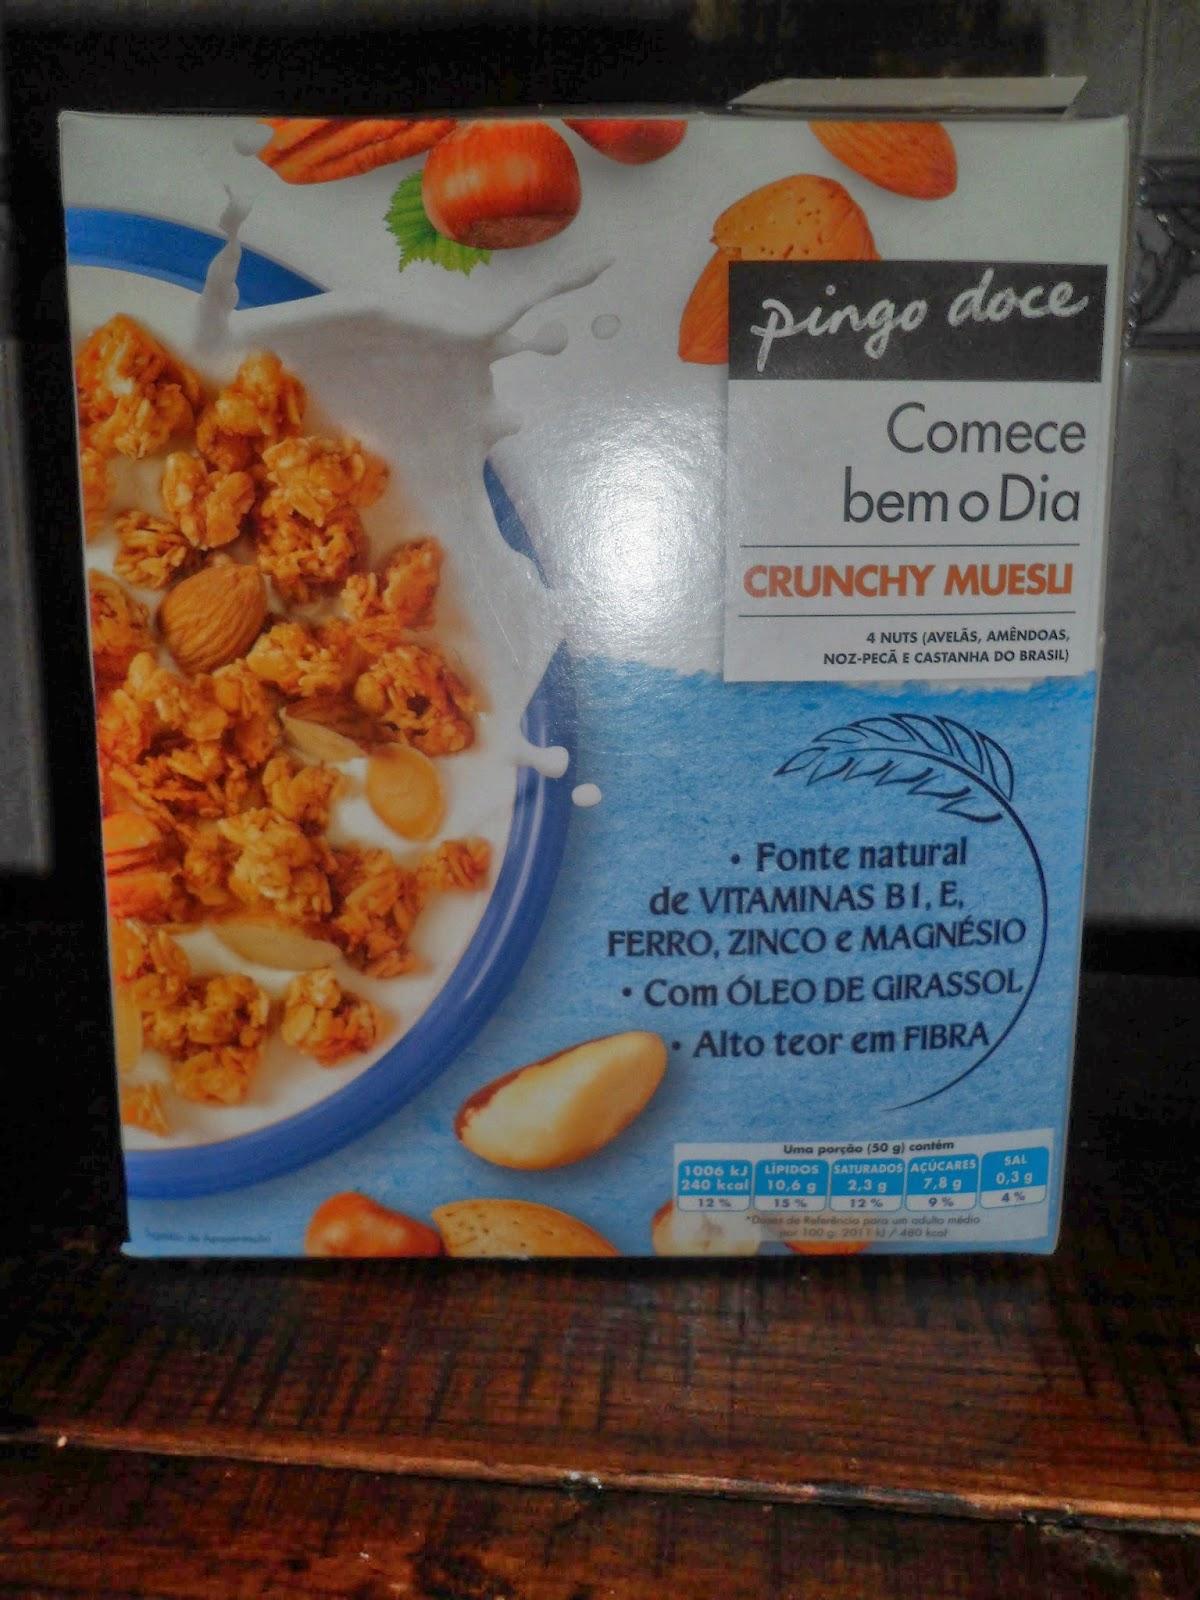 Crunchy Muesli.